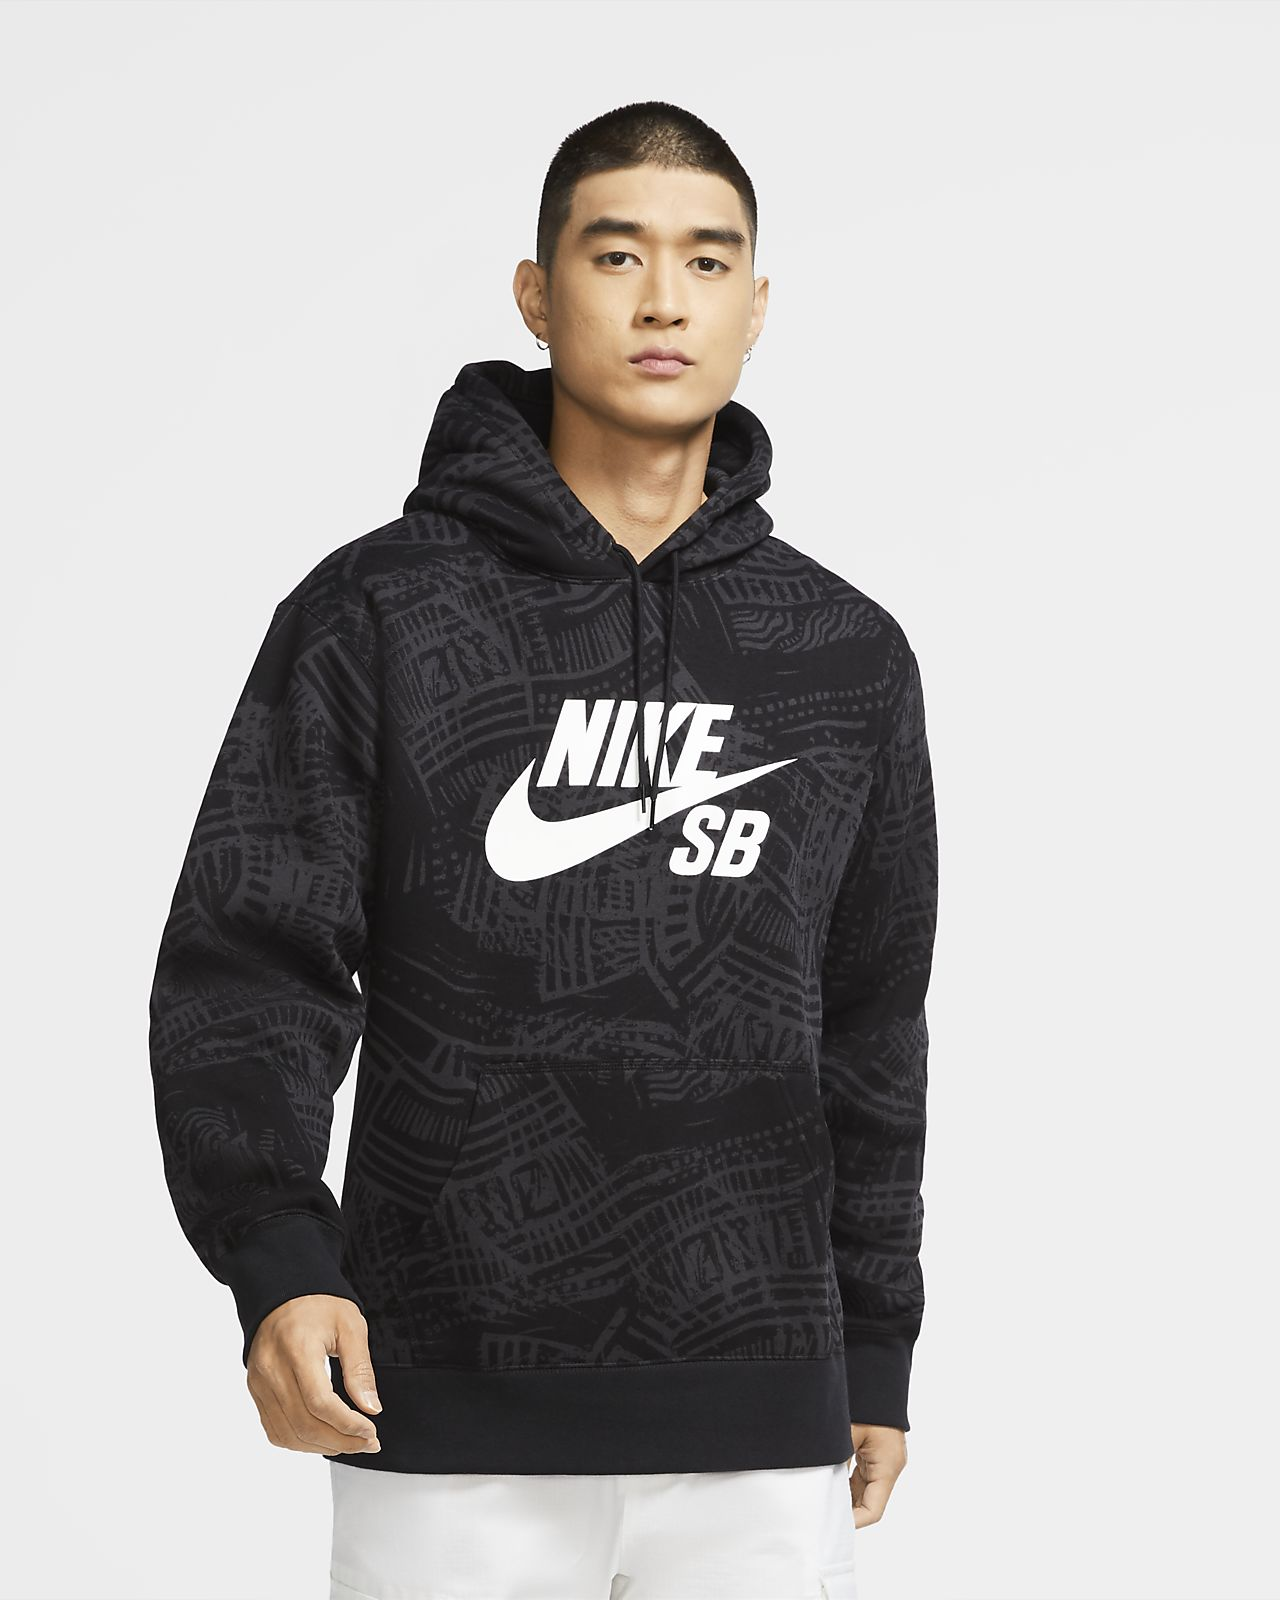 Sudadera con capucha de skateboarding estampada para hombre Nike SB